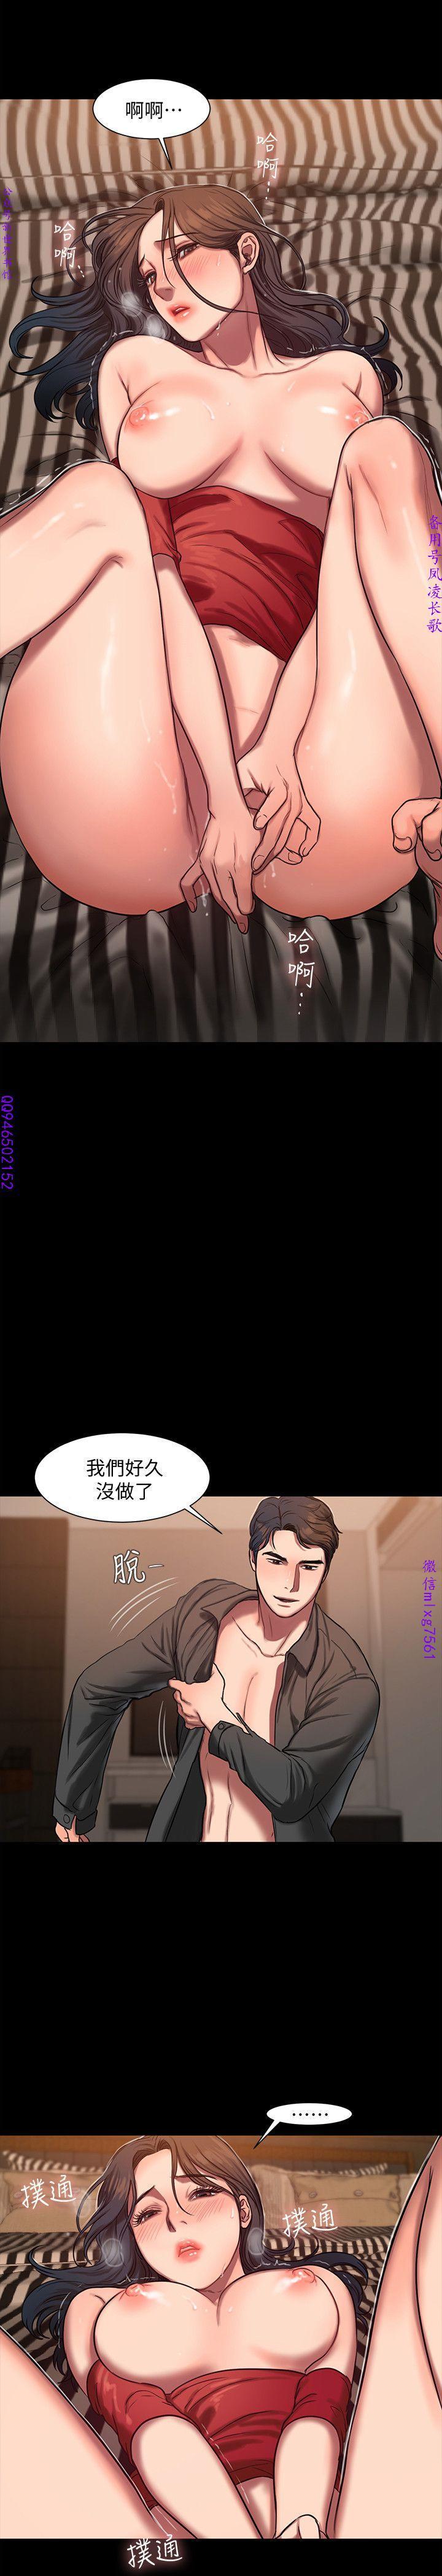 Run away 1-10【中文】 245